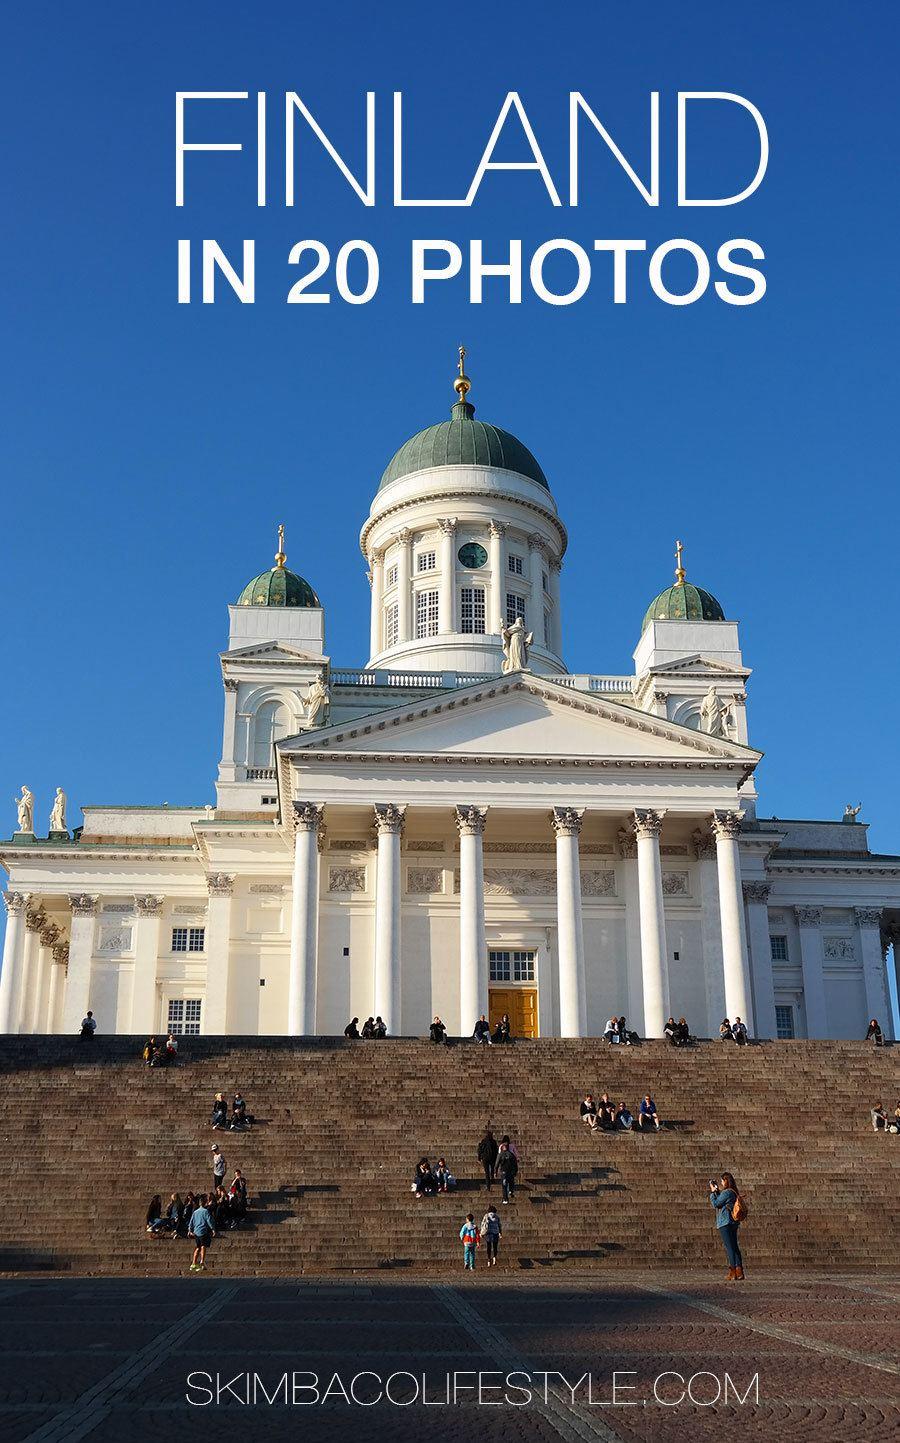 FINLAND-IN-20-PHOTOS